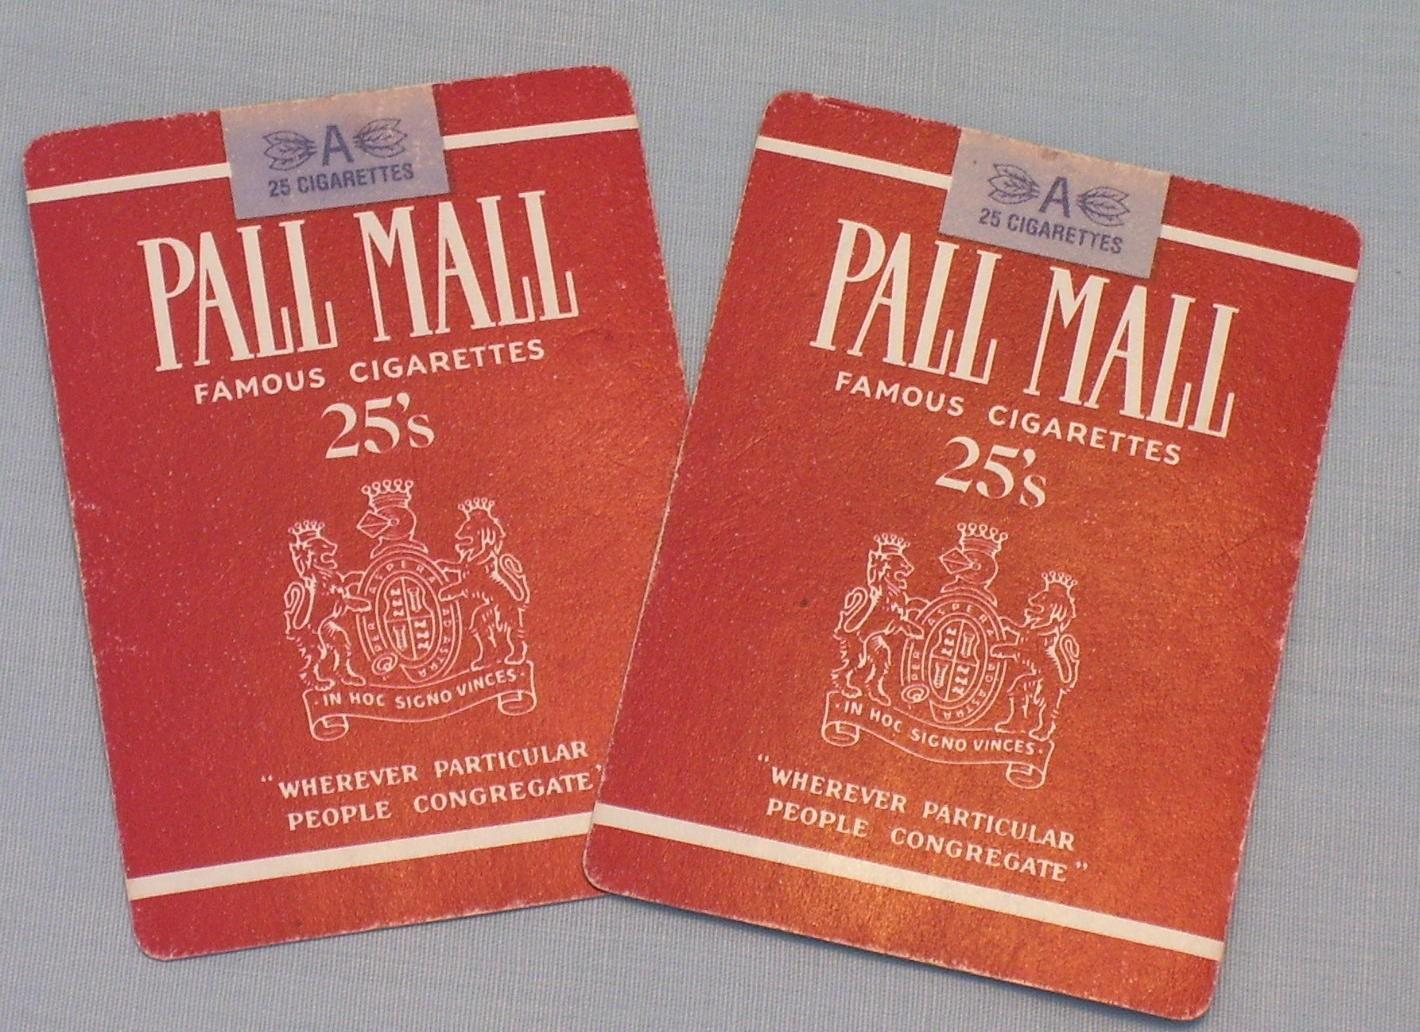 Edinburgh mall coupons